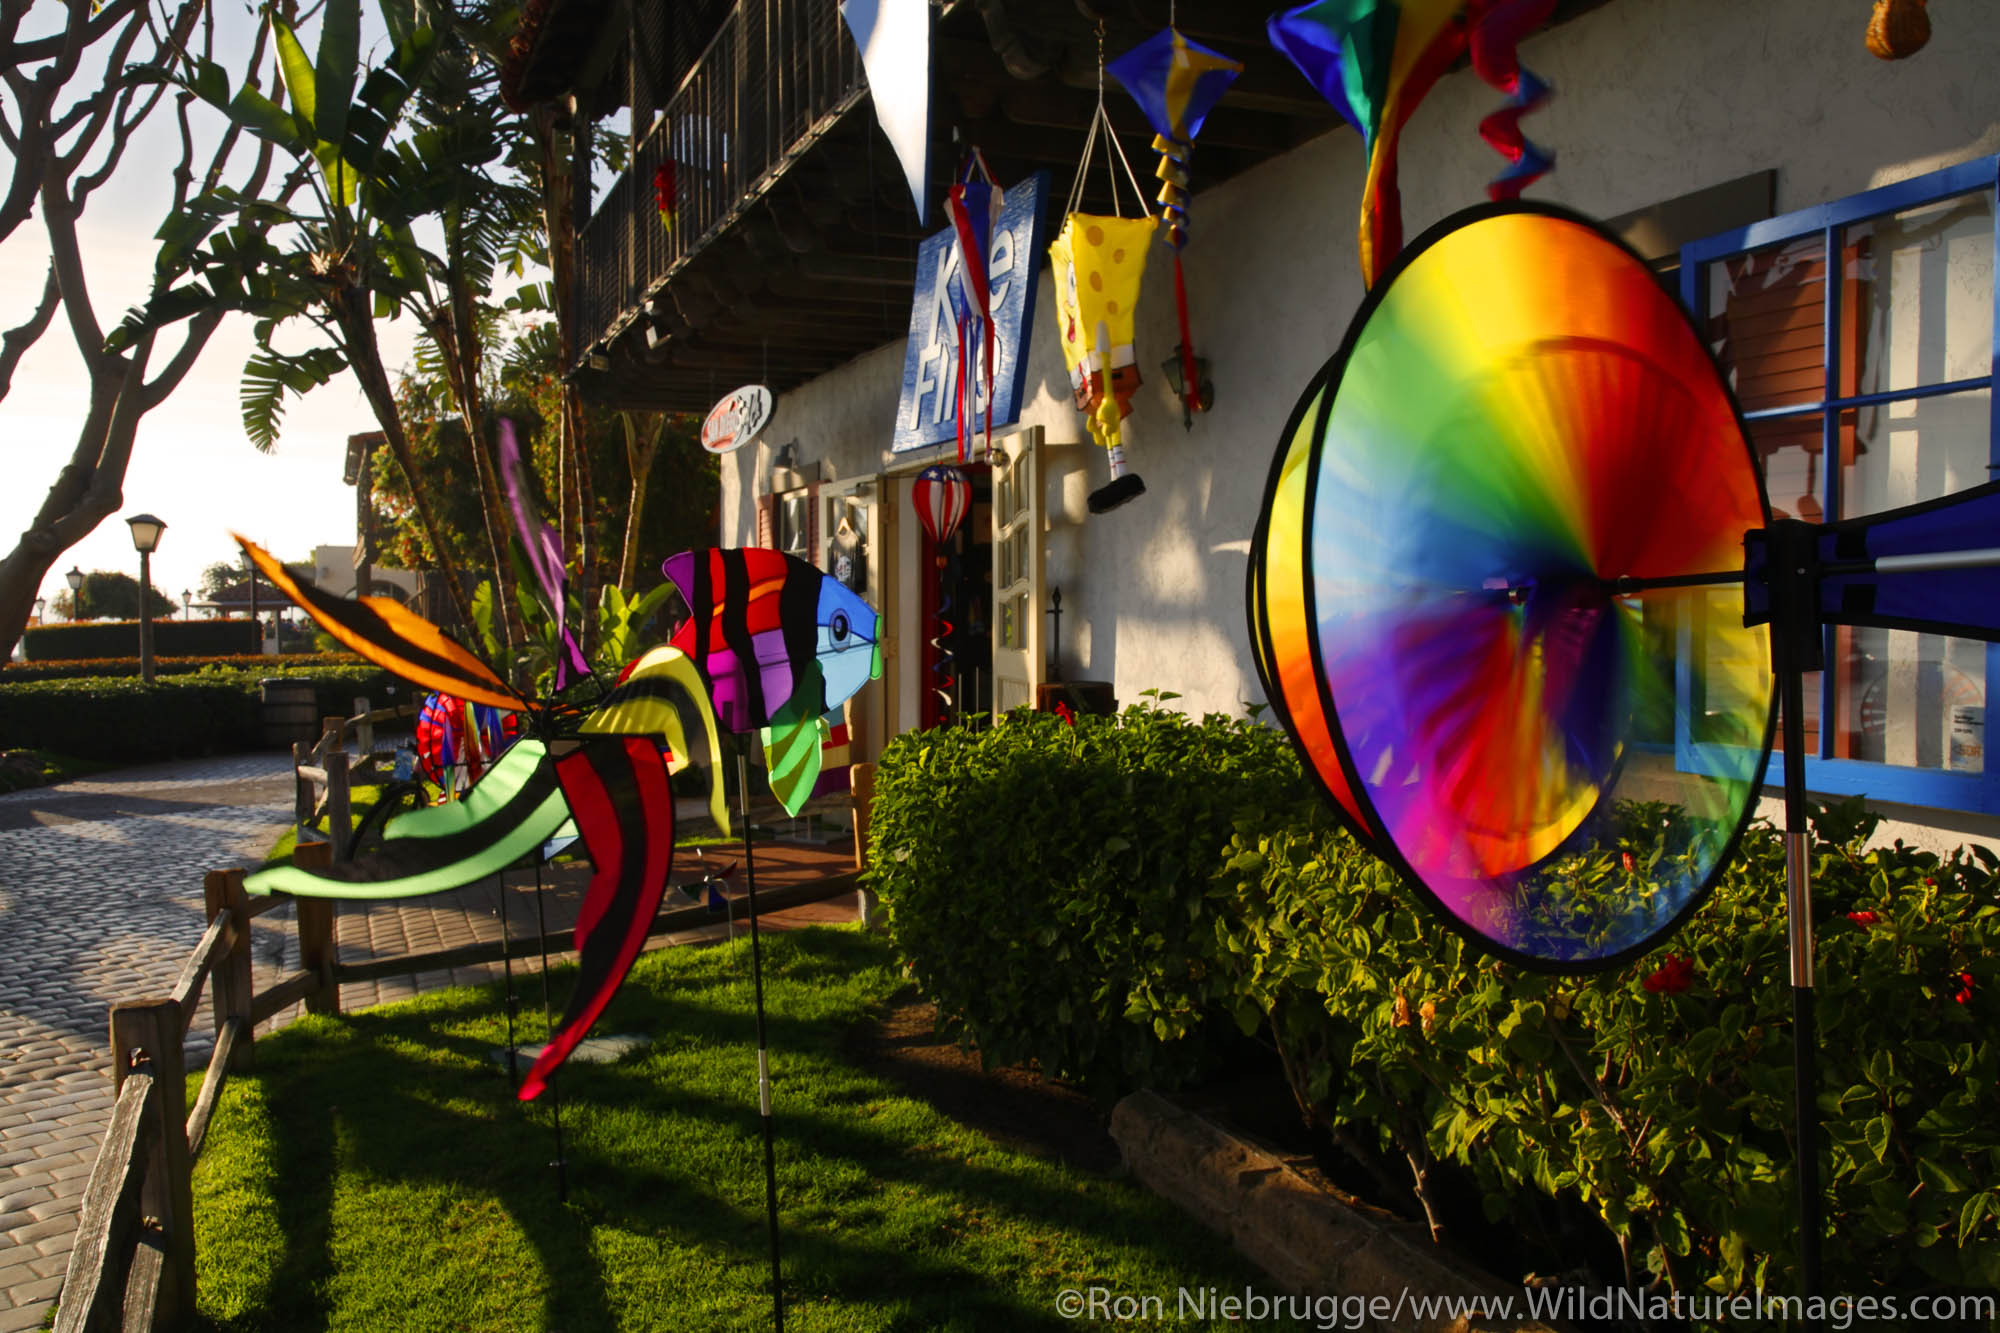 A kite store in Seaport Village, San Diego, California.